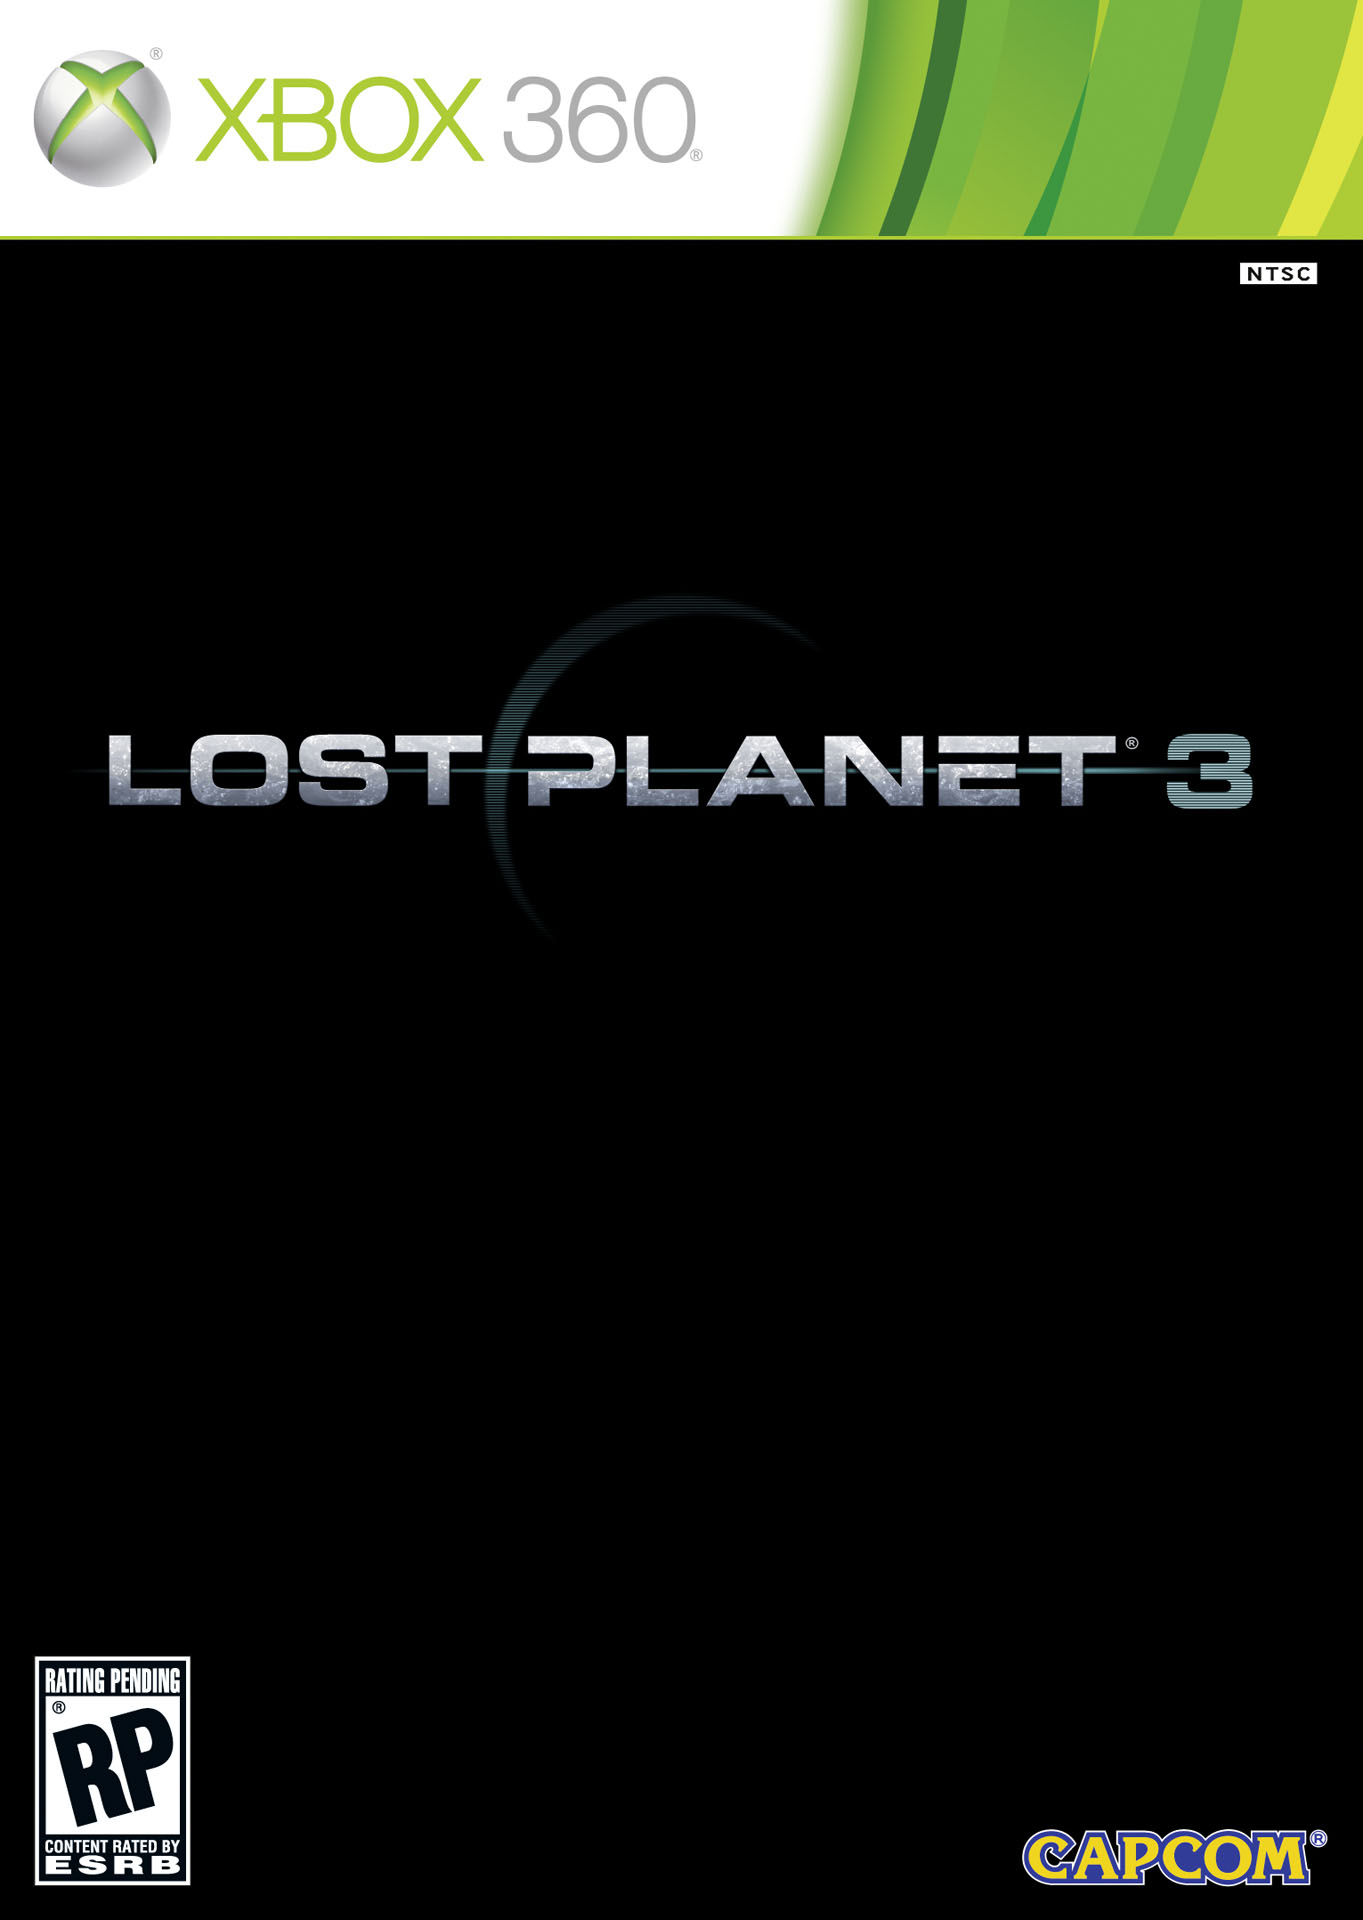 lp3 wip pack 360 us بازگشت یخی | پیش نمایش Lost Planet 3